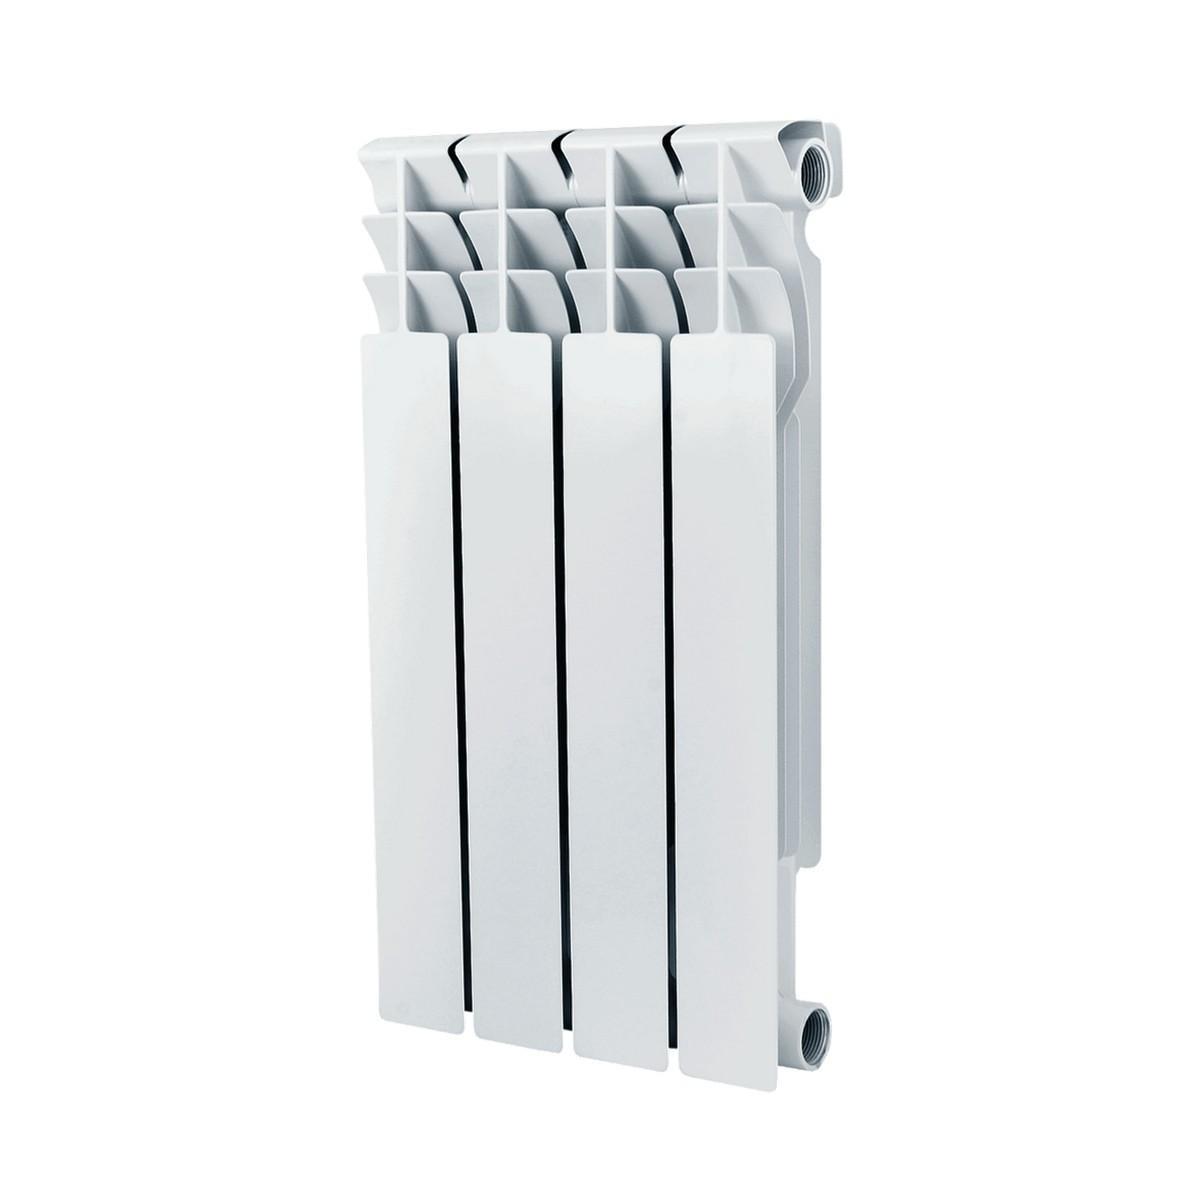 Радиатор биметалл Ultra Plus 500 7 секций Ogint  117-5975